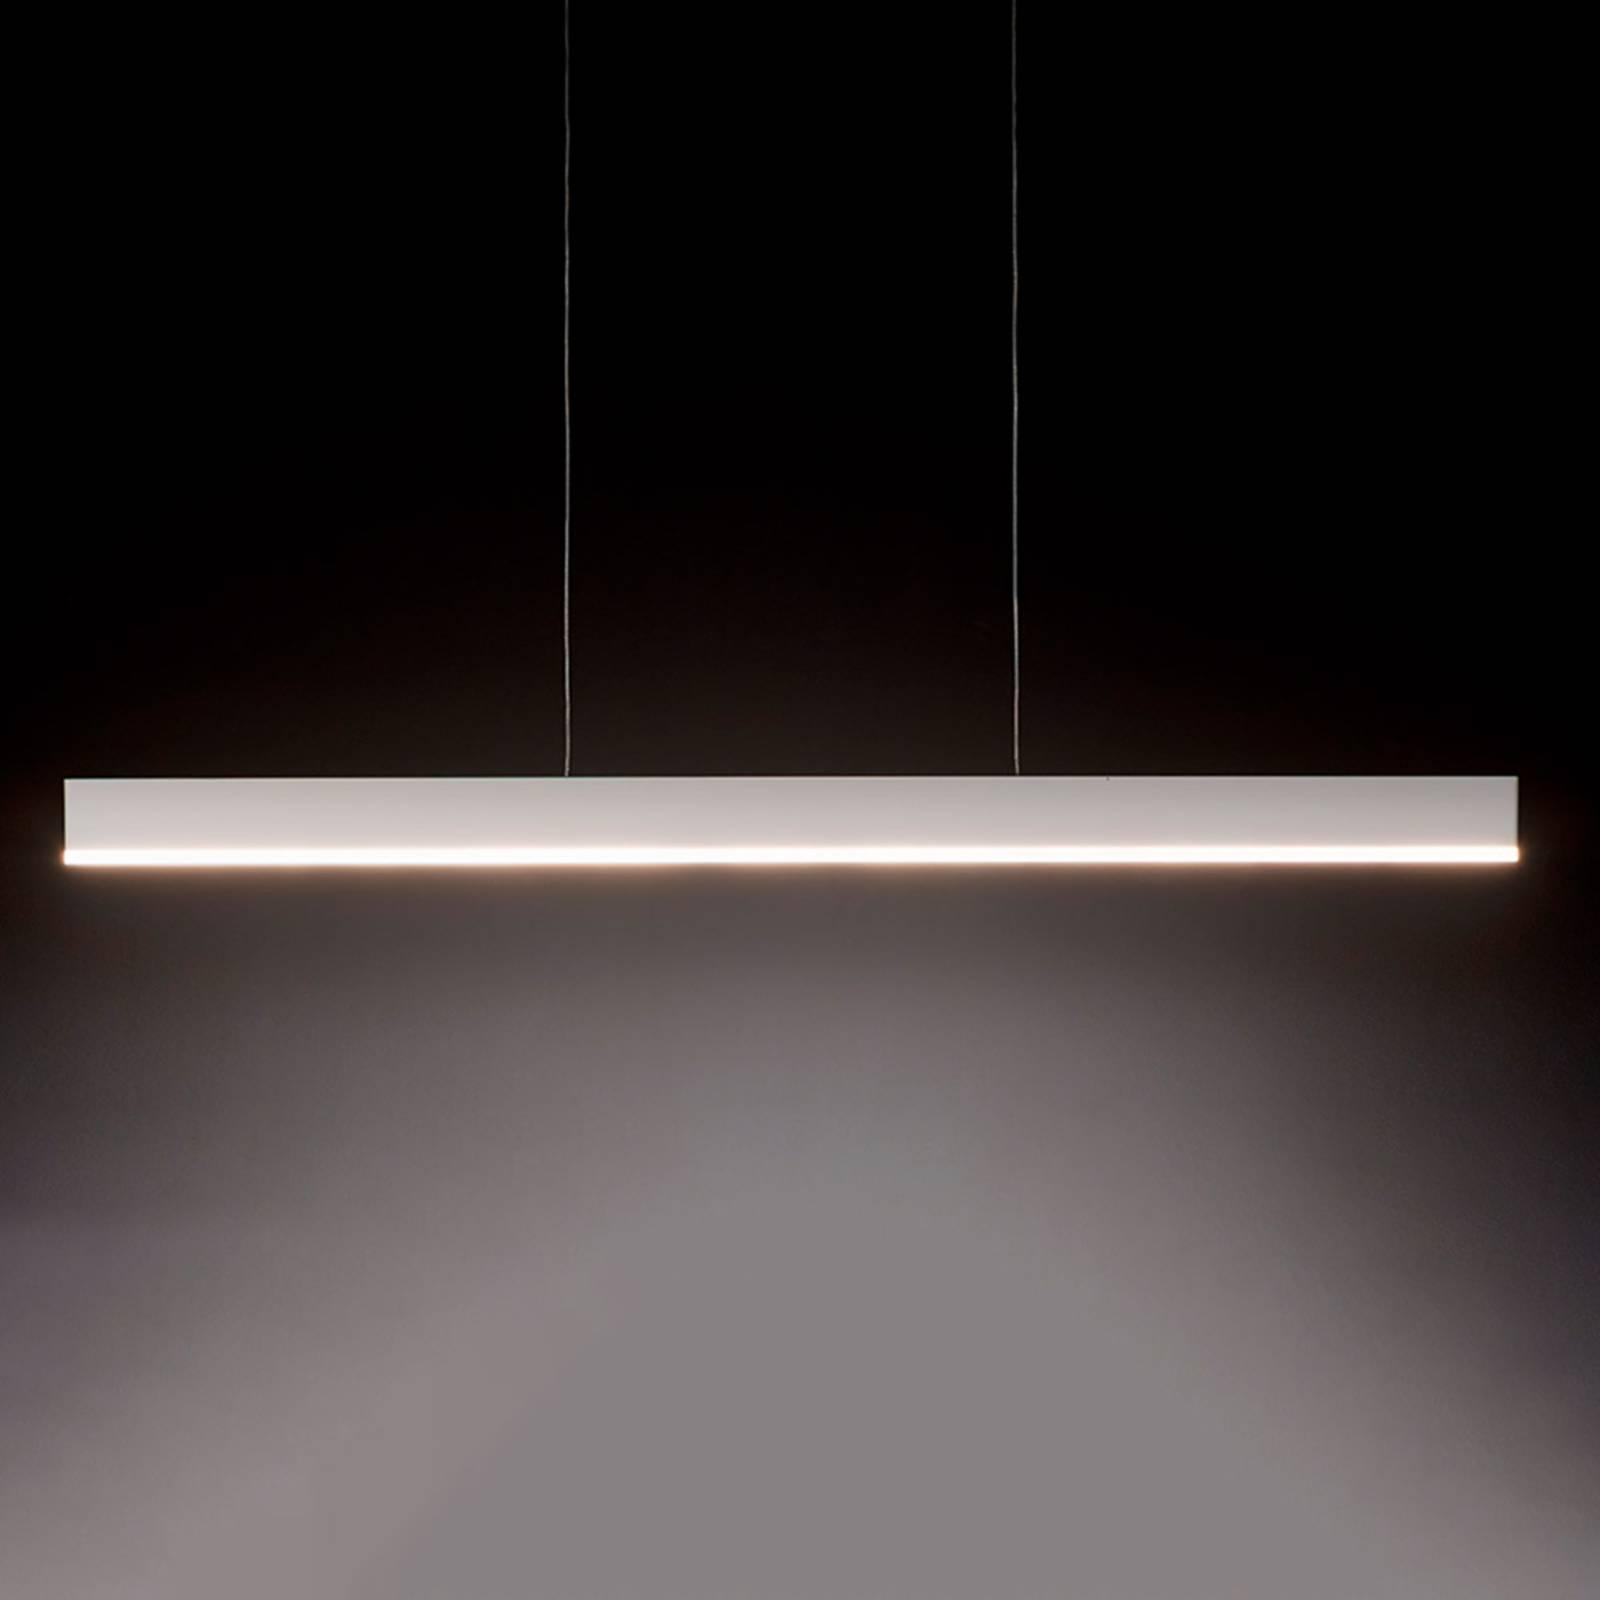 LED-Pendelleuchte Riga, 160 cm